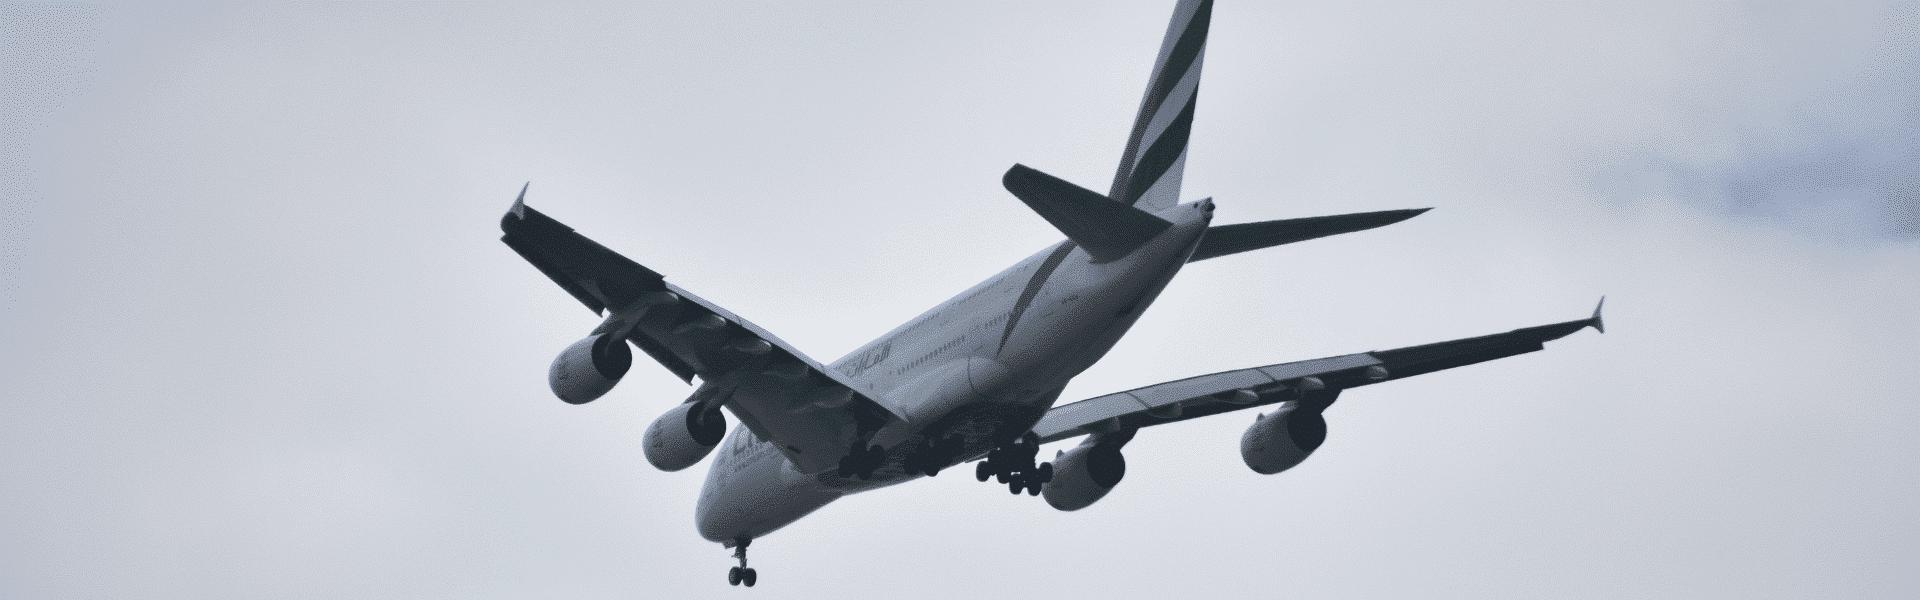 British Airways Plane Flying Overhead